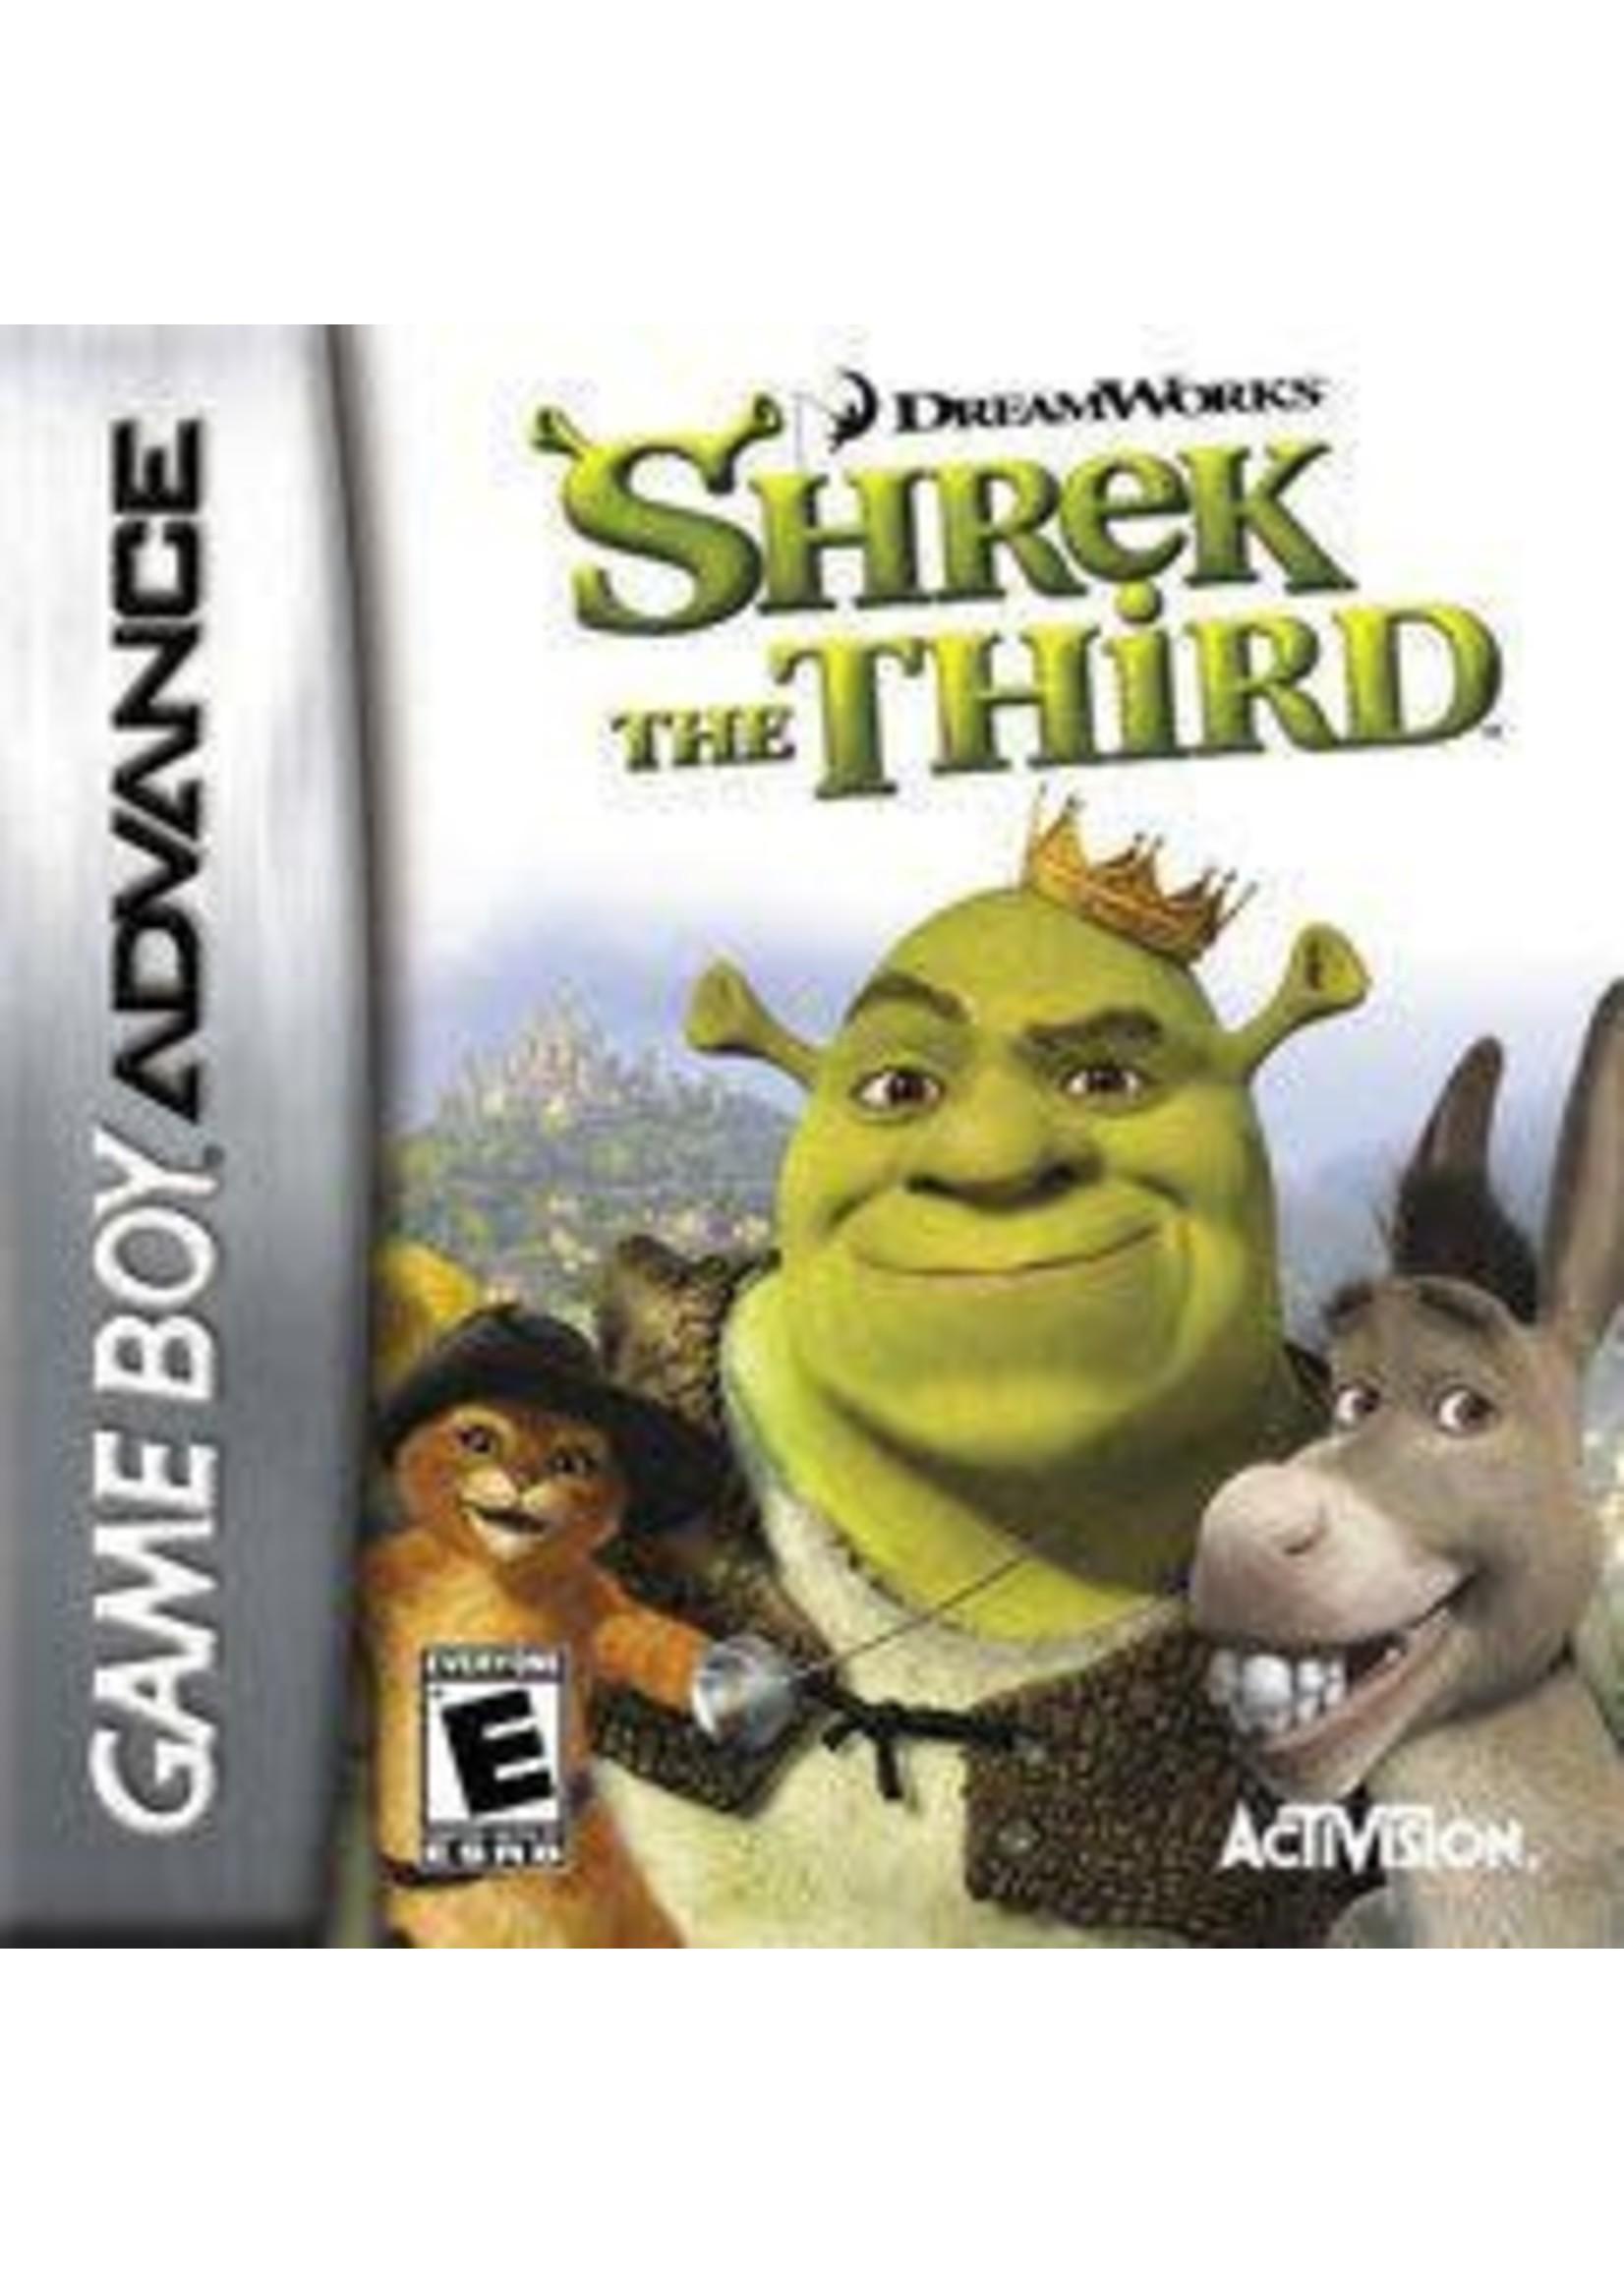 Shrek The Third GameBoy Advance